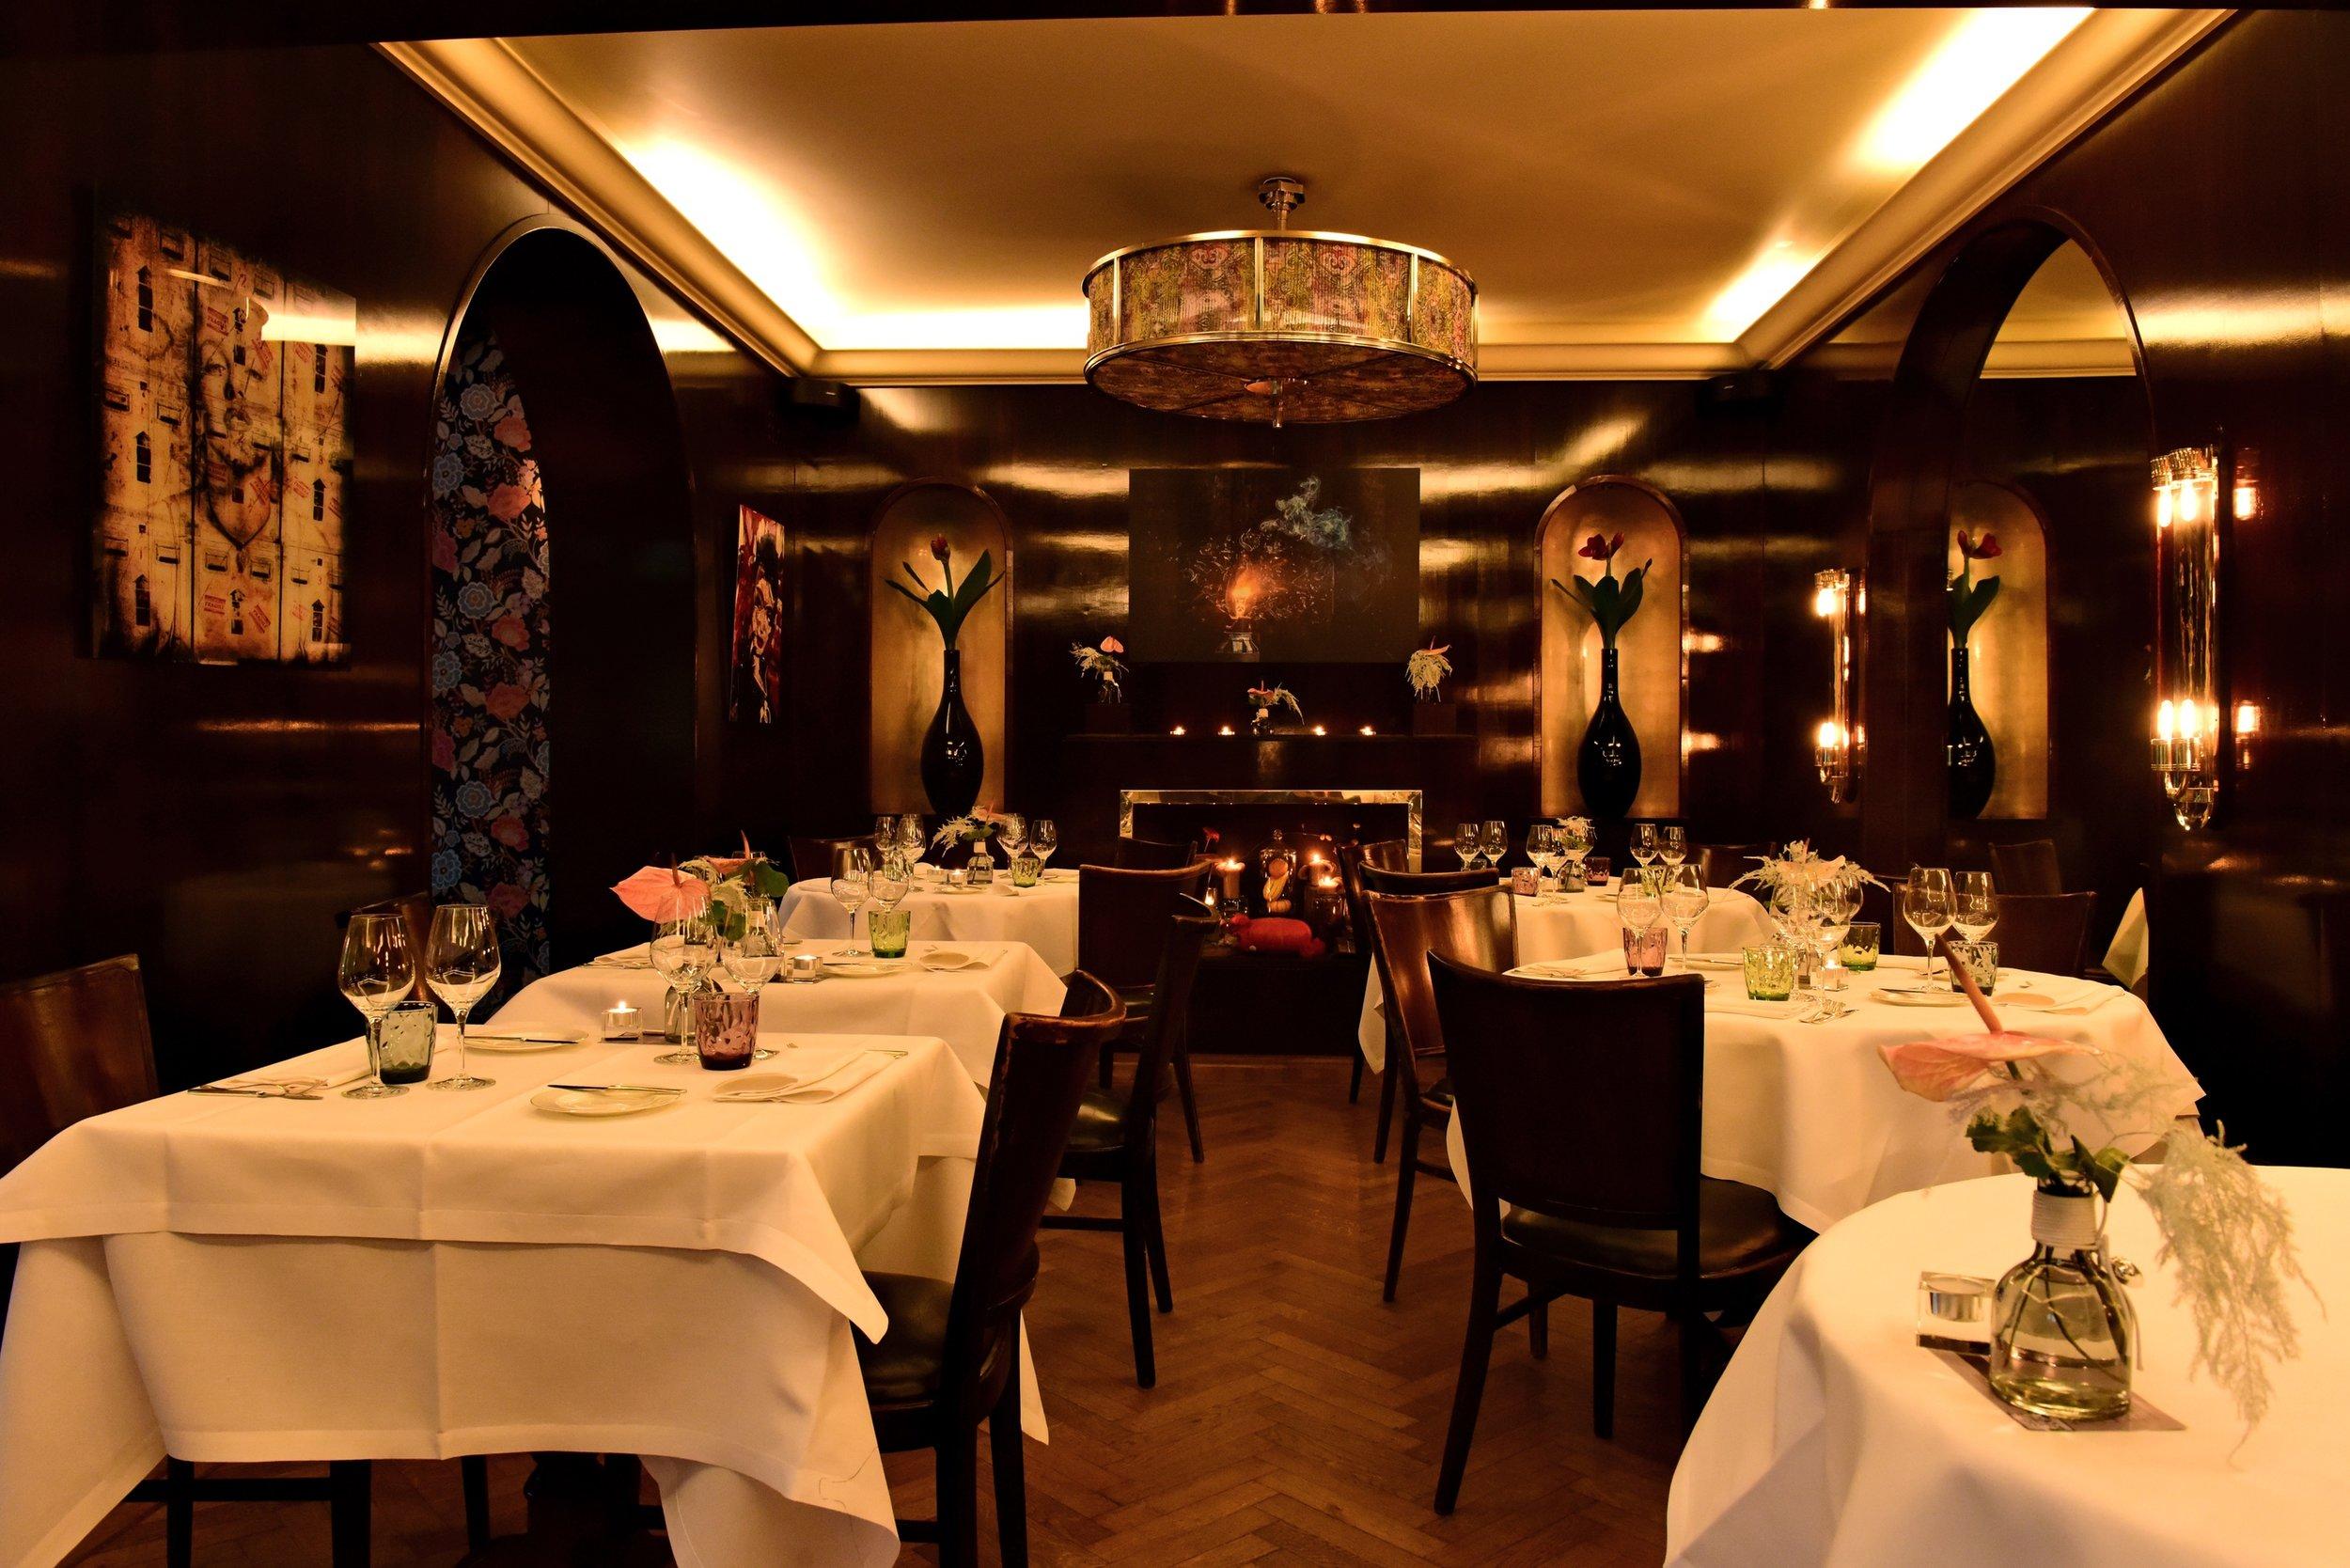 10 restaurant de mangerie lauwe tablefever bart albrecht .jpg